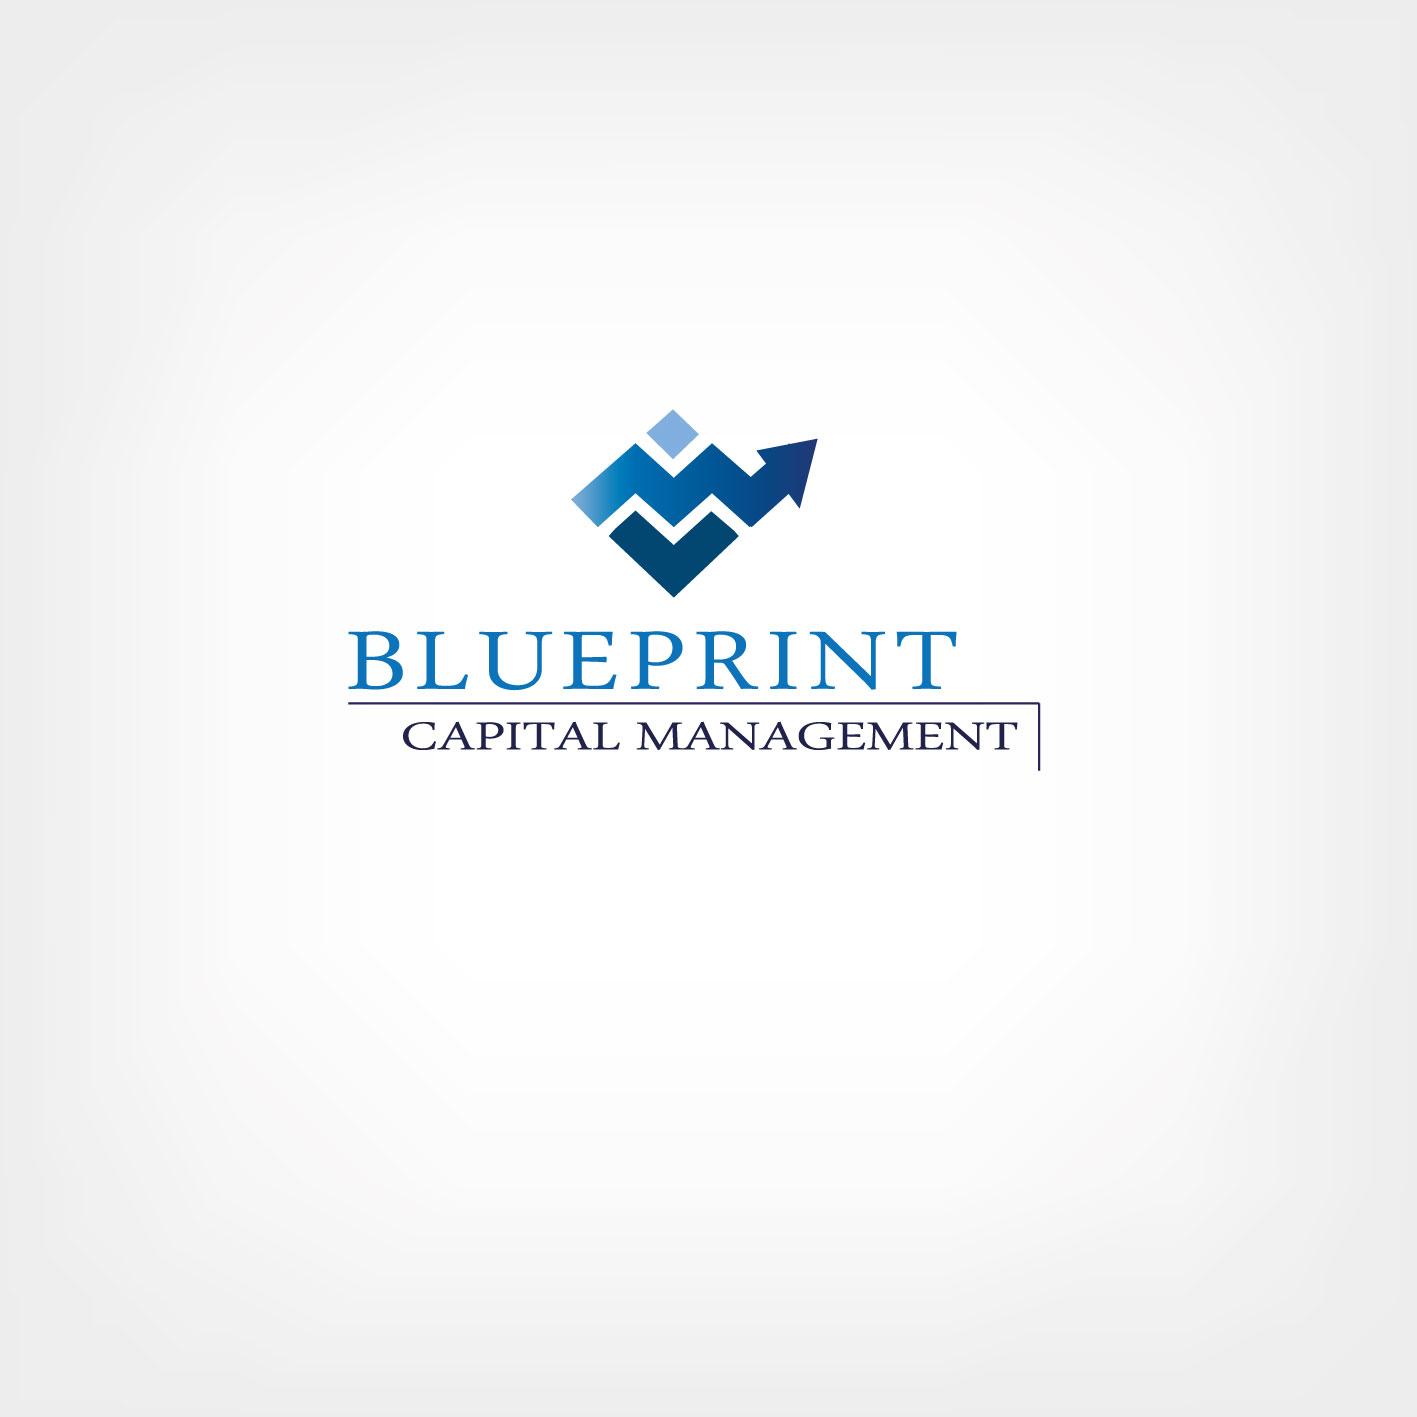 Elegant playful logo design for neil cataldi by nidhi design logo design by nidhi for investment firm blueprint capital management needs a logo design malvernweather Images